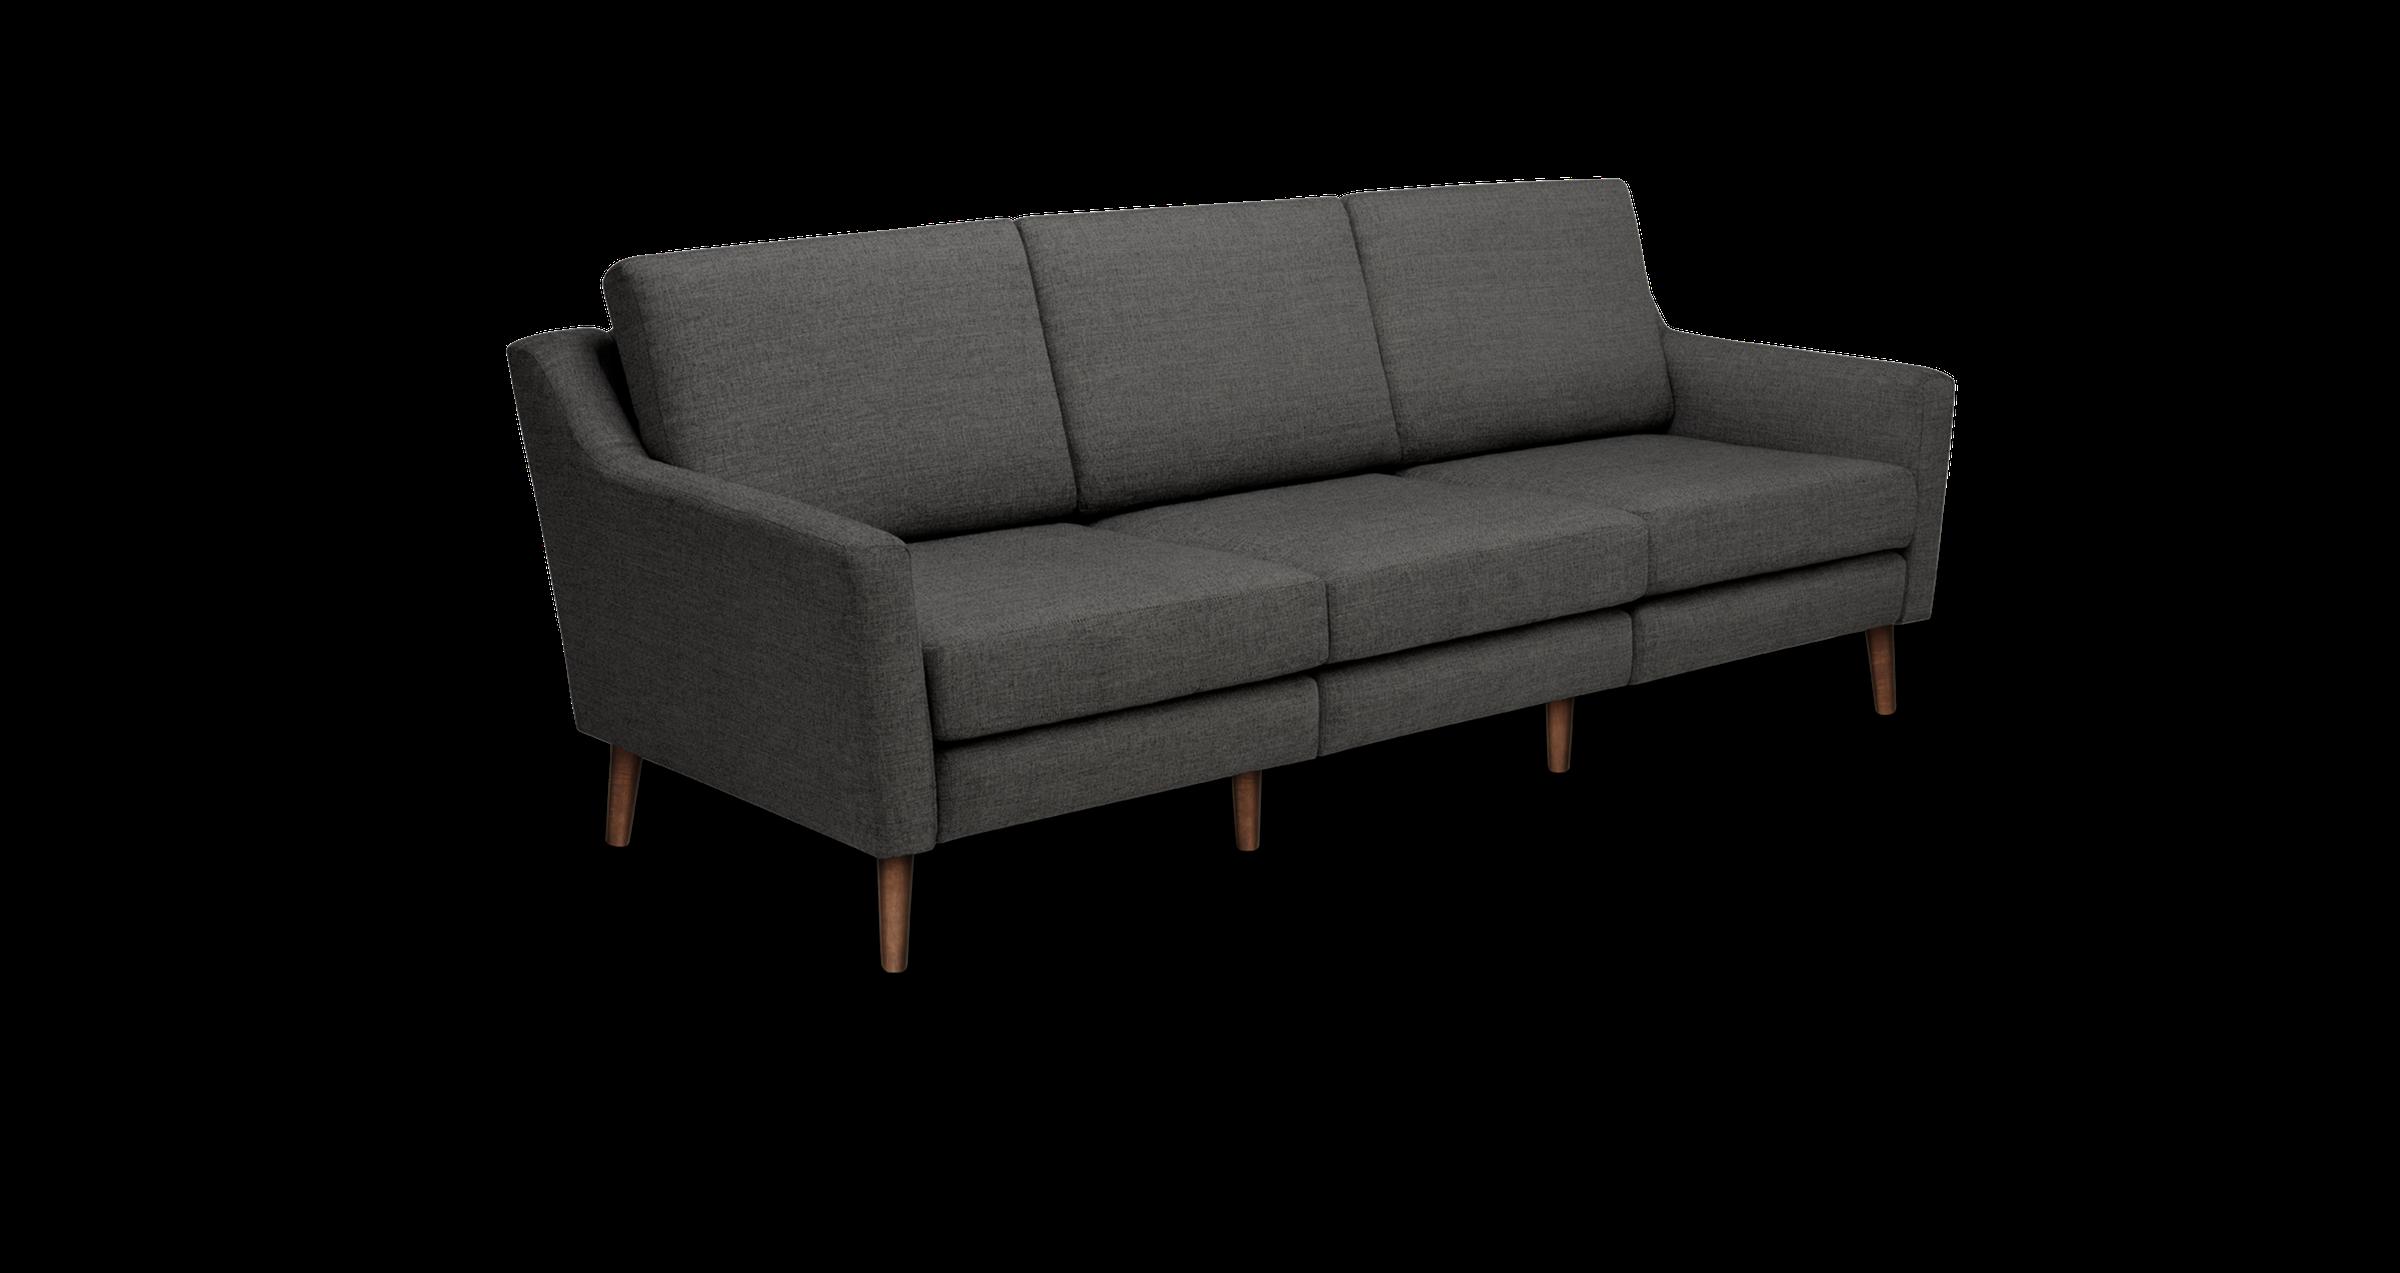 Fine Custom Sofas And Sectionals Couch Design Custom Sofa Machost Co Dining Chair Design Ideas Machostcouk